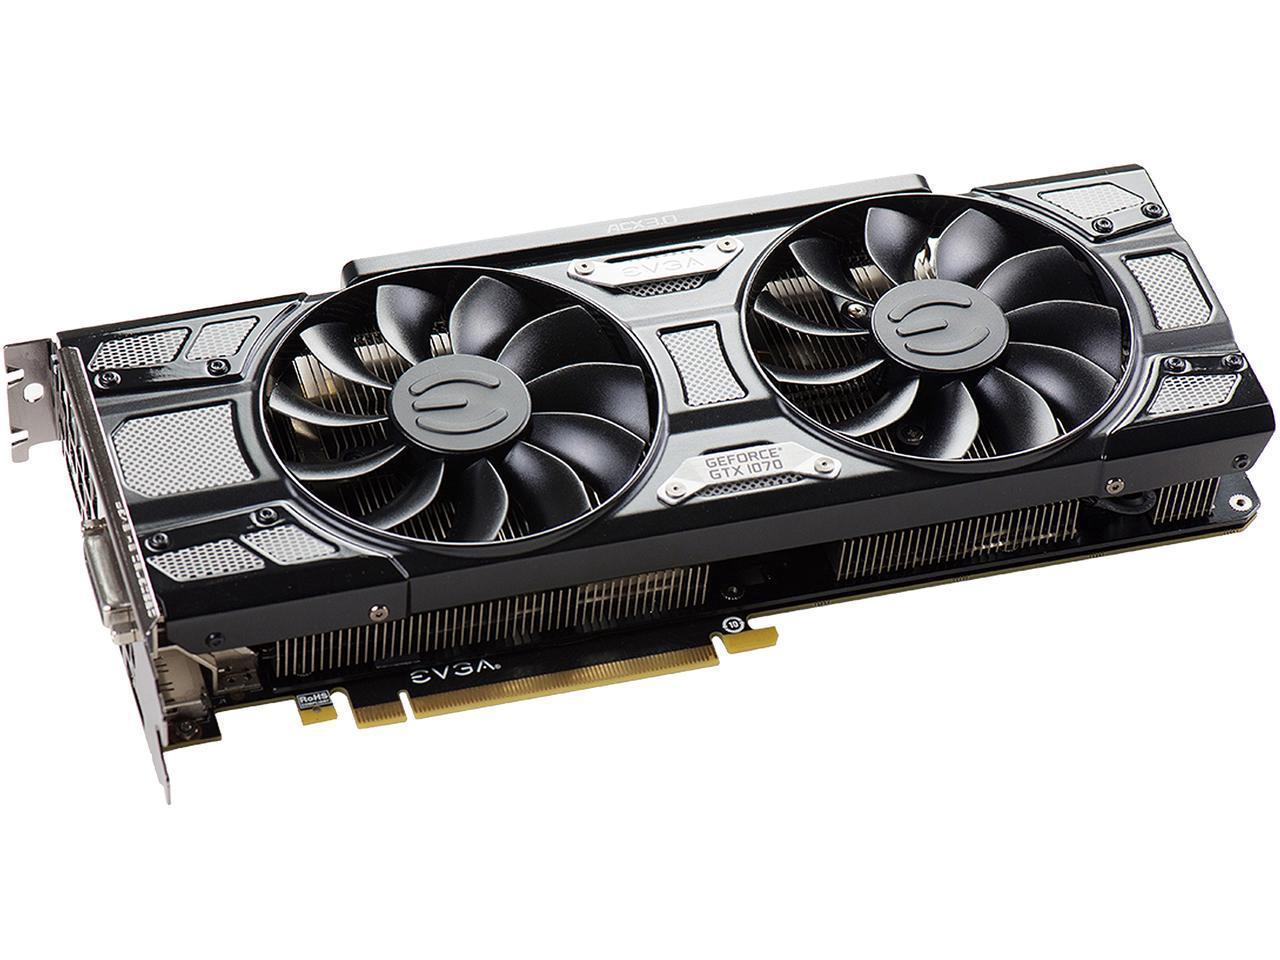 Newegg: EVGA GeForce GTX 1070 Black Edition  (Impuestos incluídos)